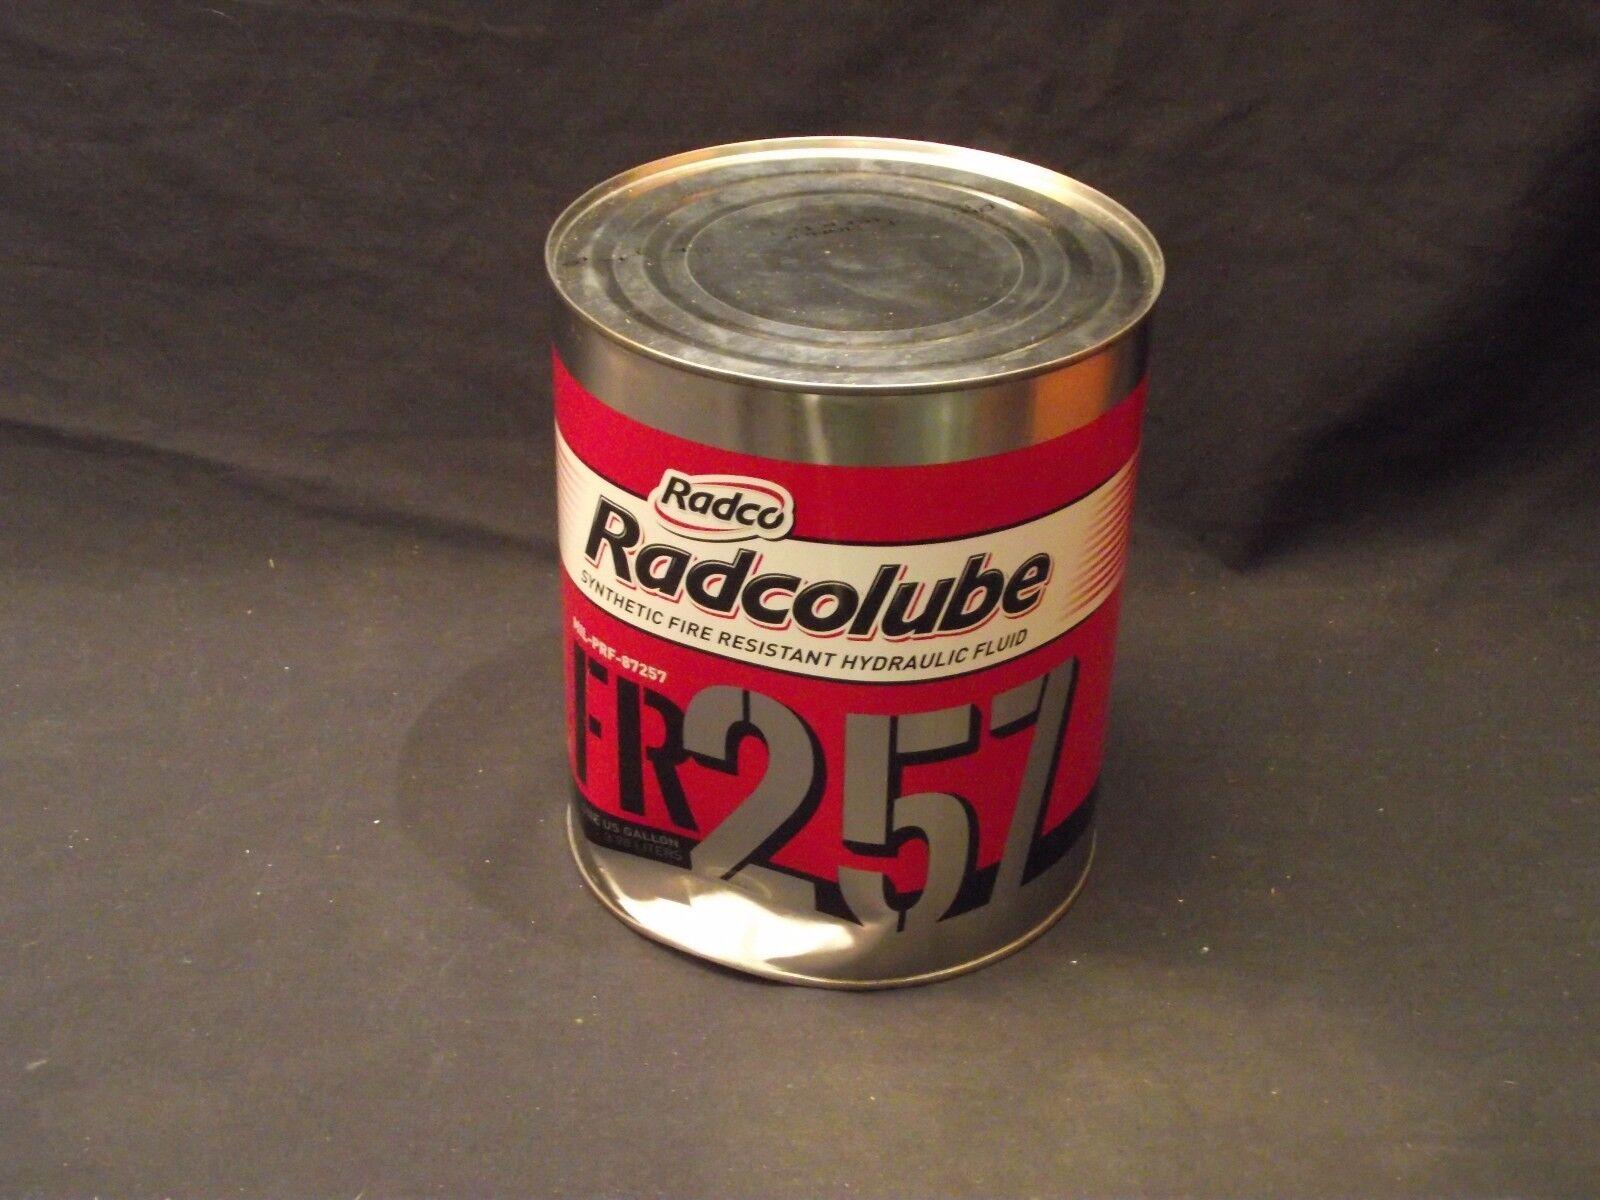 RADCOLUBE FR287 synthetic fire resistant Hydraulic fluid aviation  mfg 11/15